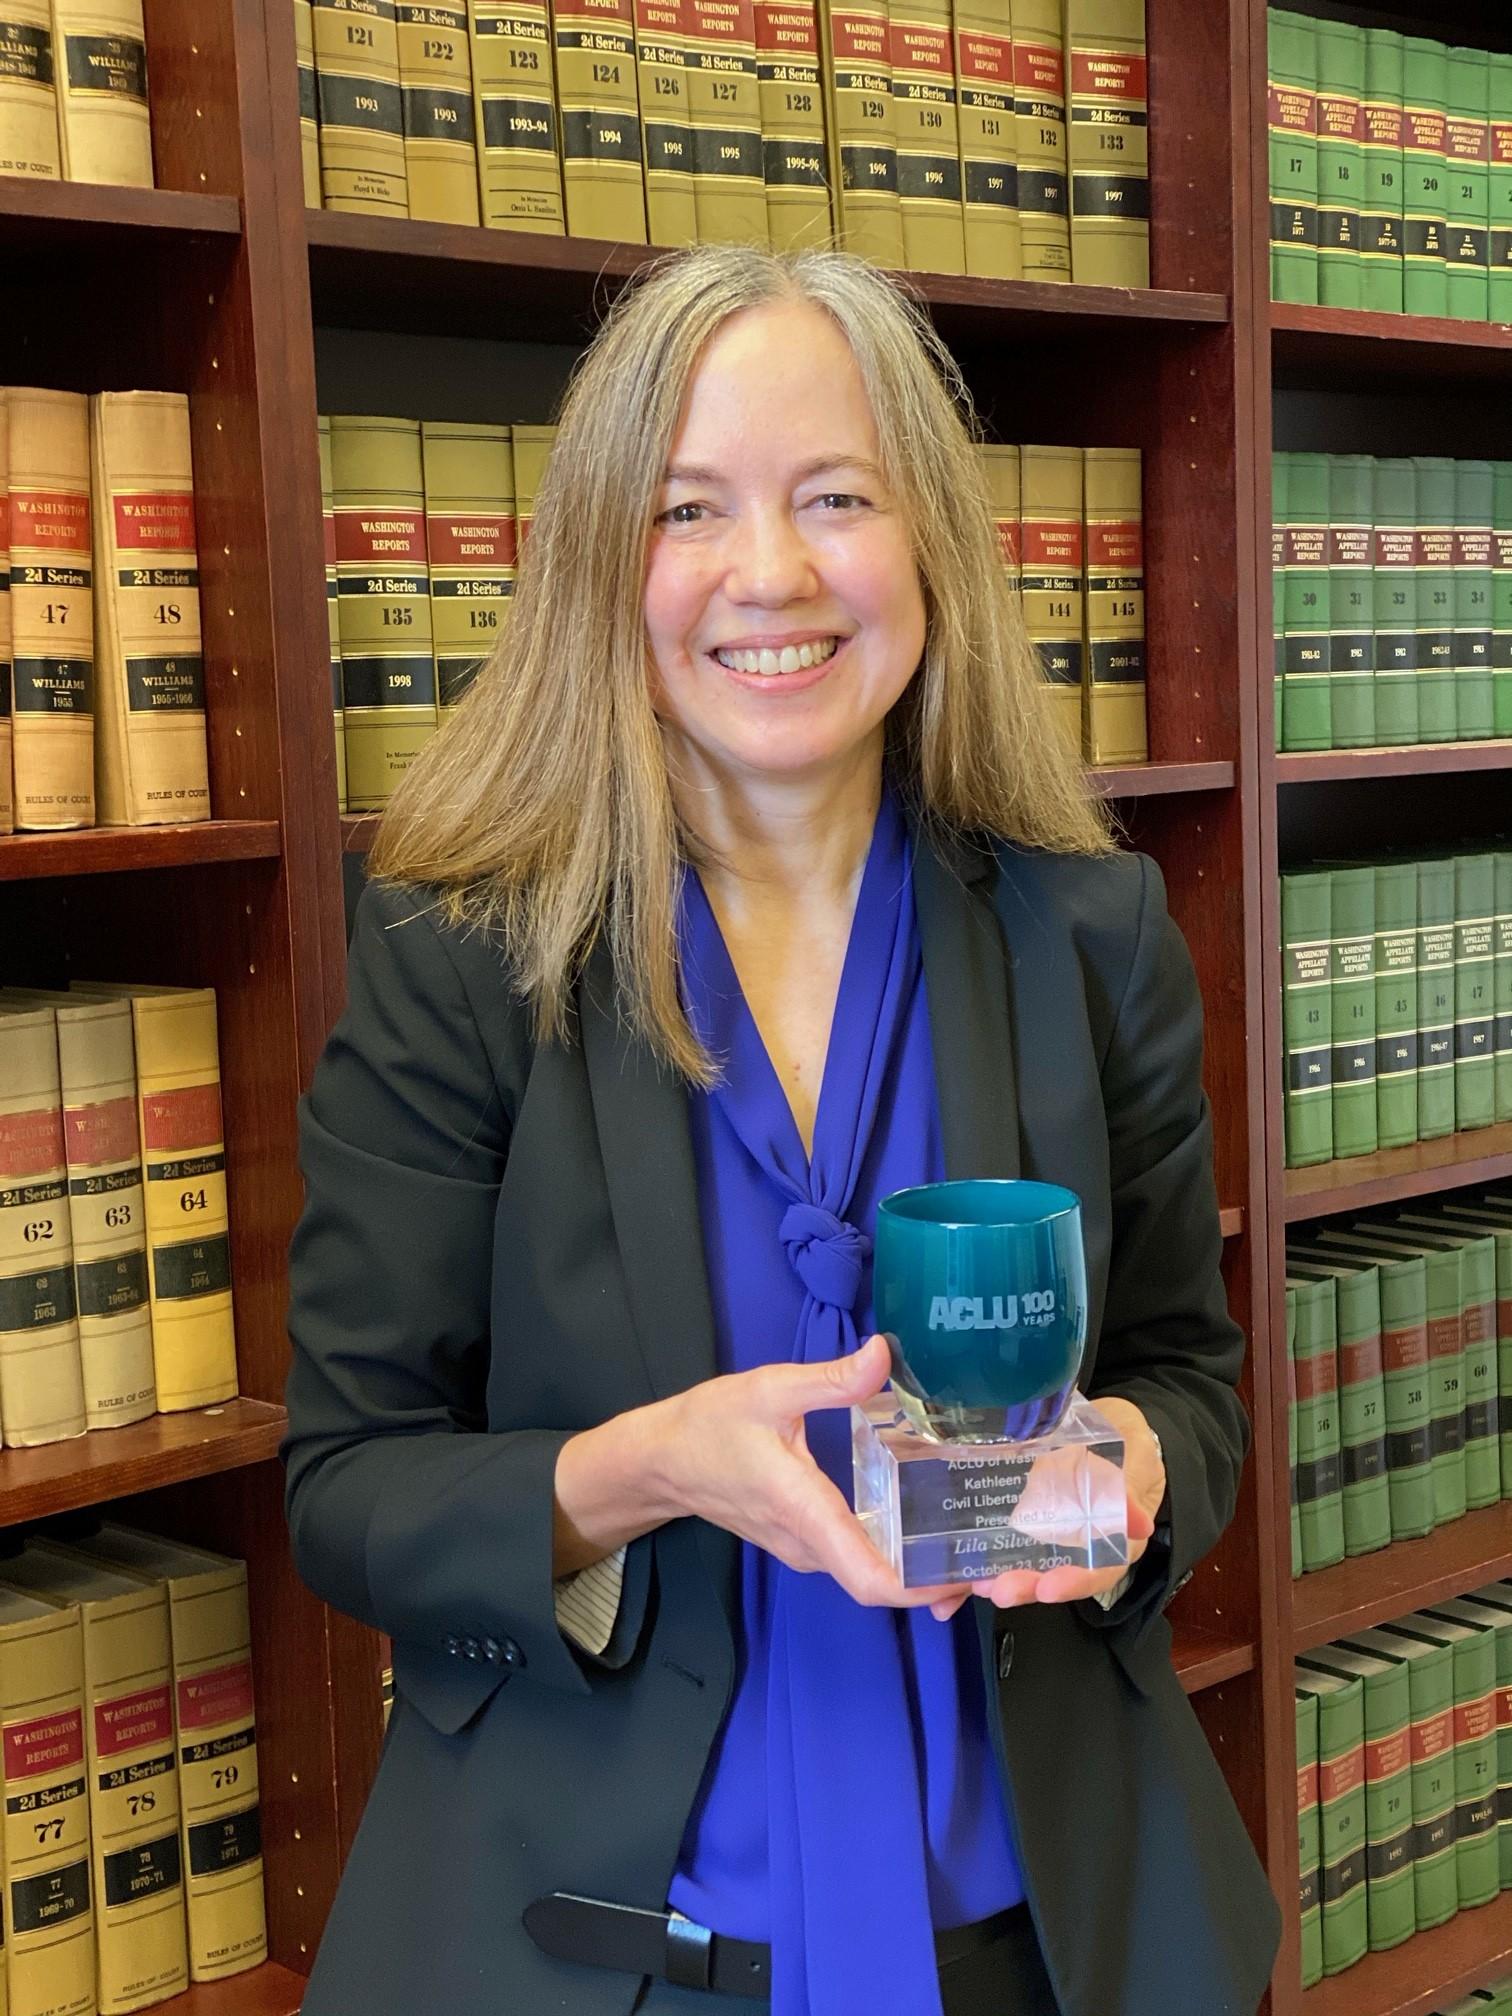 Lila Silverstein wins ACLU's Civil Libertarian award. Congratulations!